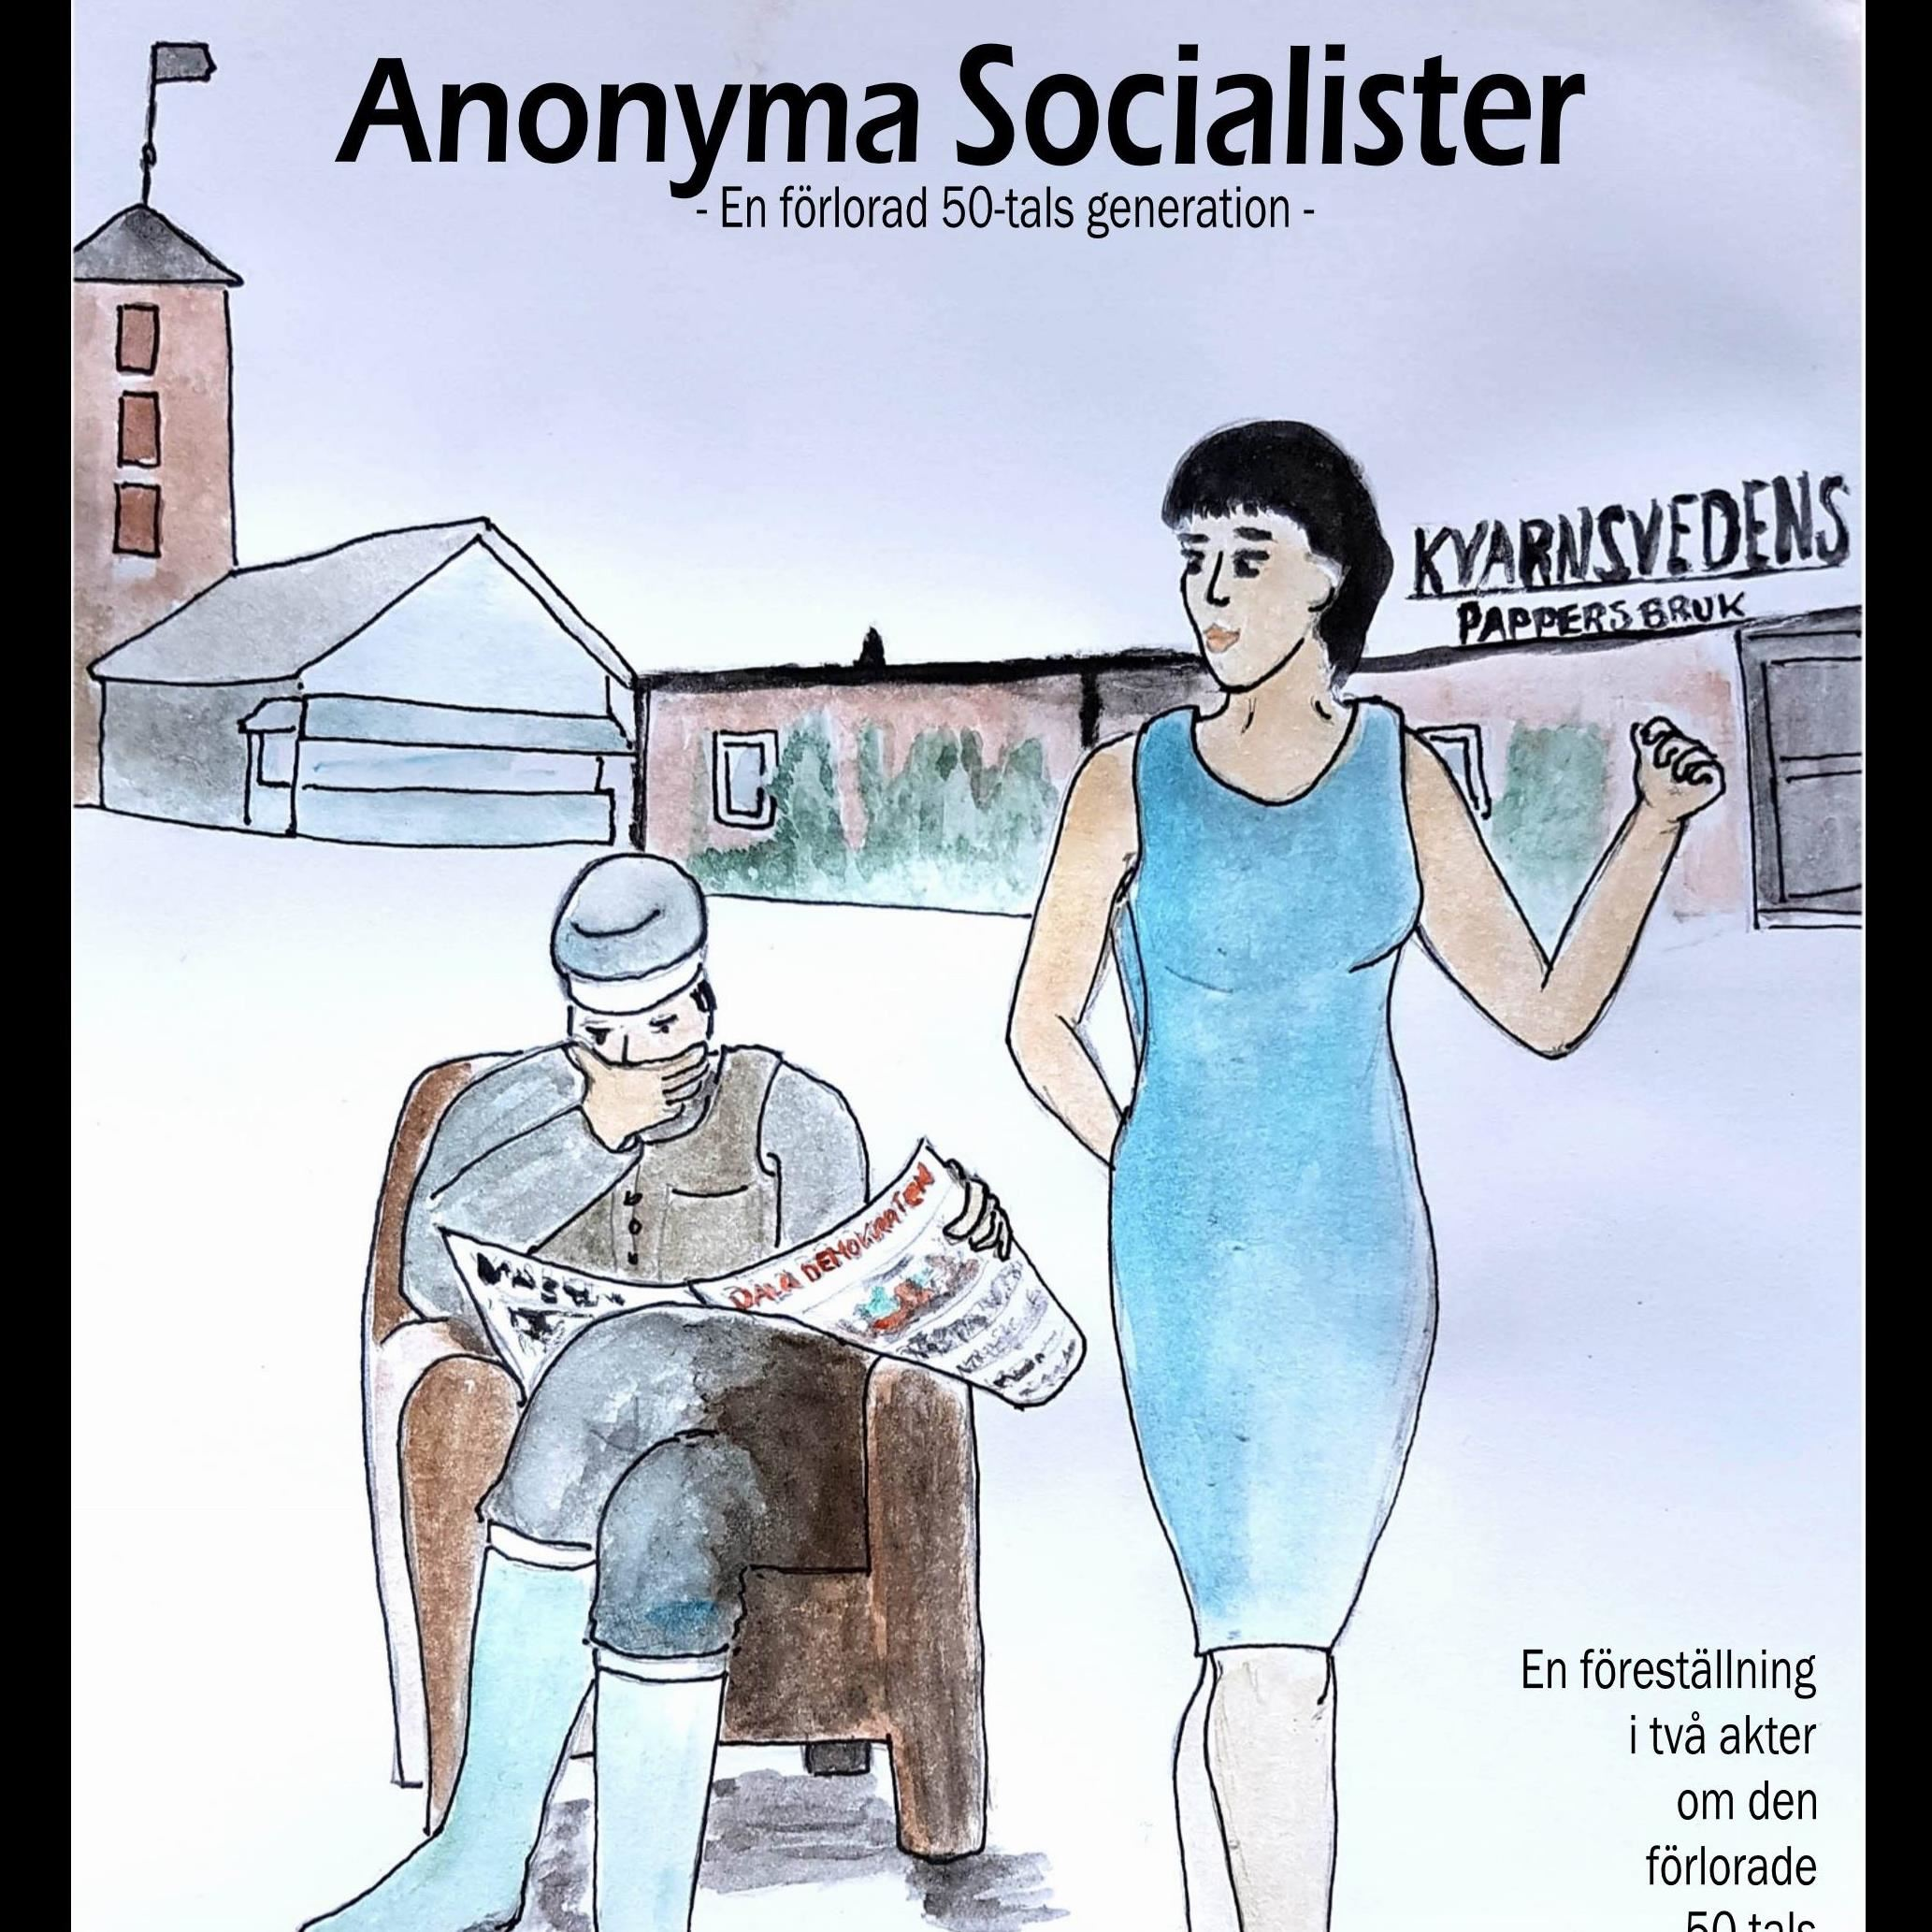 Anonyma Socialister